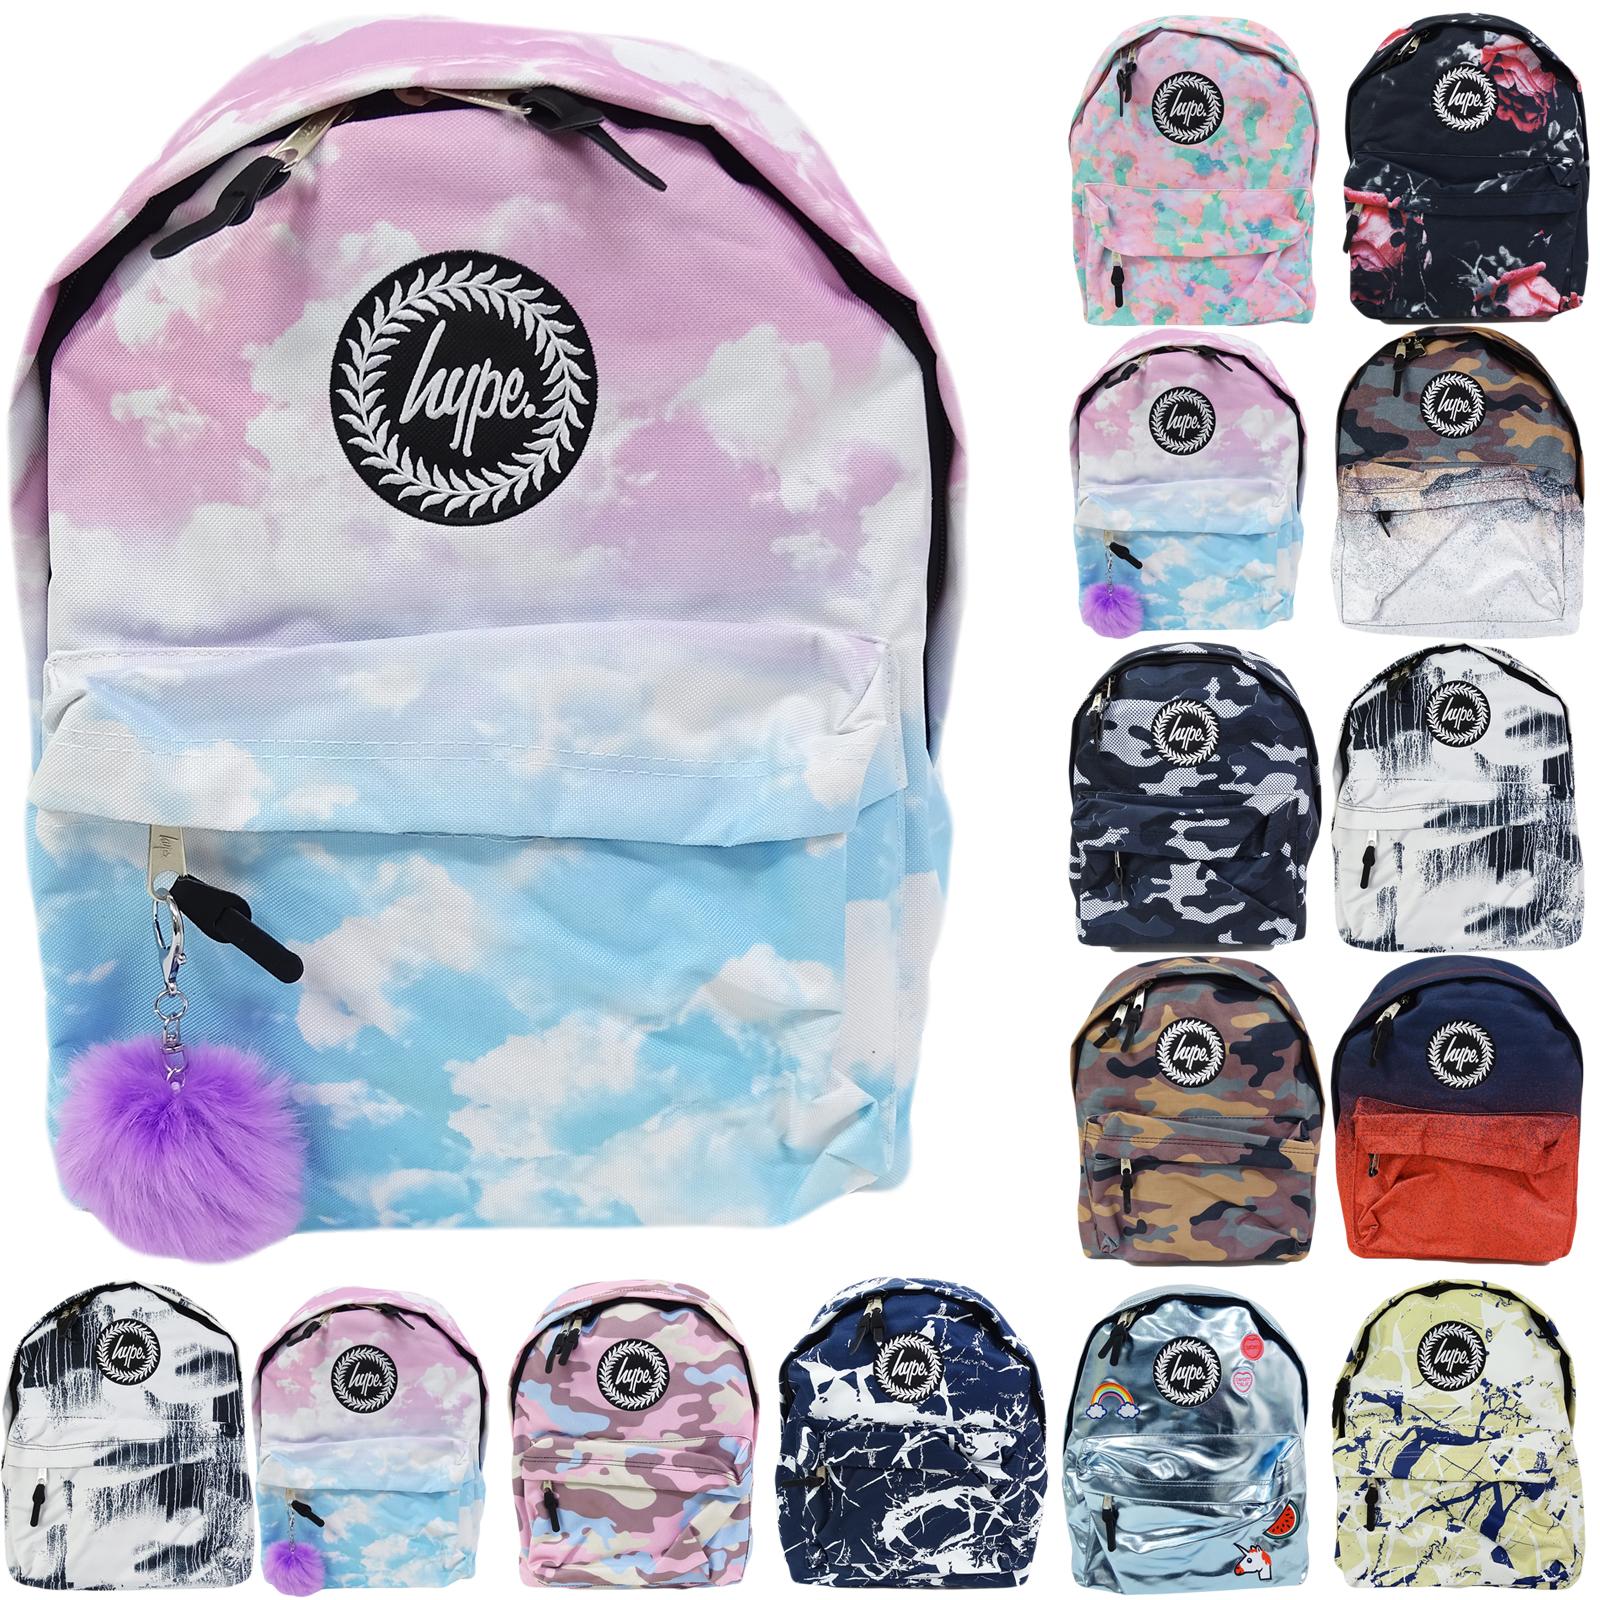 b68fb8f0d5 Sentinel Boys   Unisex School Hype Backpack Bags - NEW HYPE BAGS